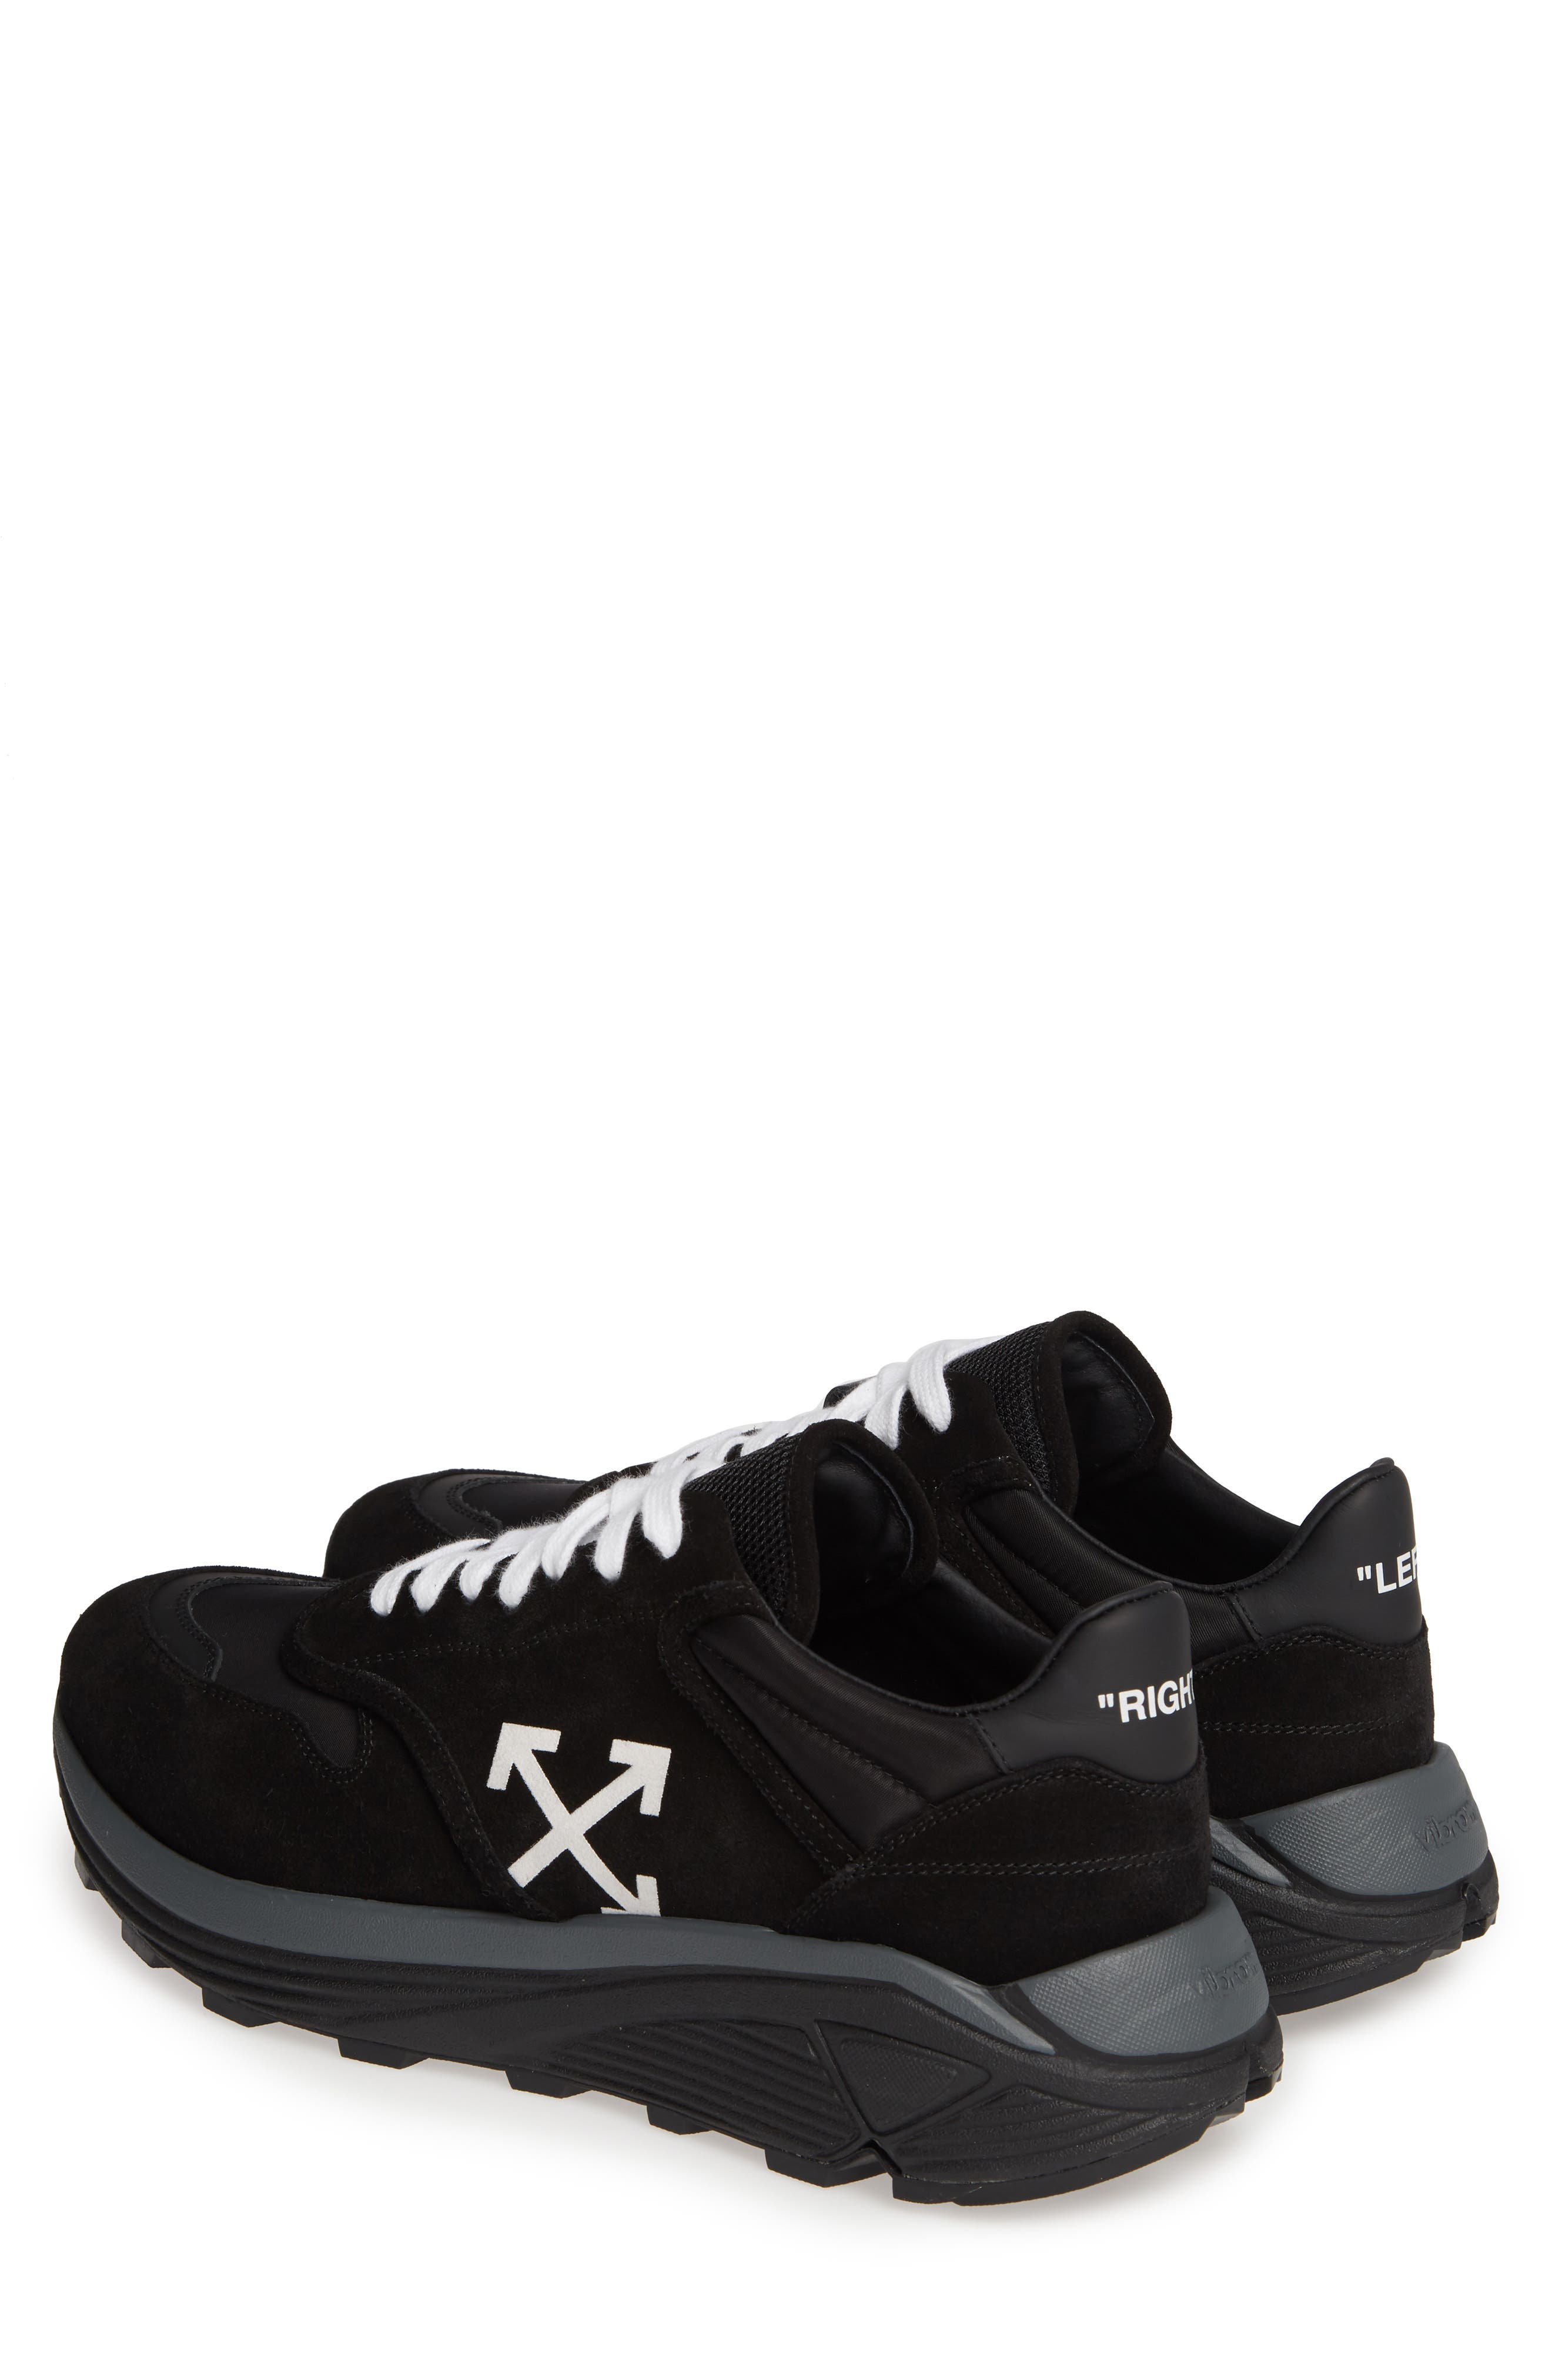 Jogger Sneaker,                             Alternate thumbnail 3, color,                             BLACK/ WHITE